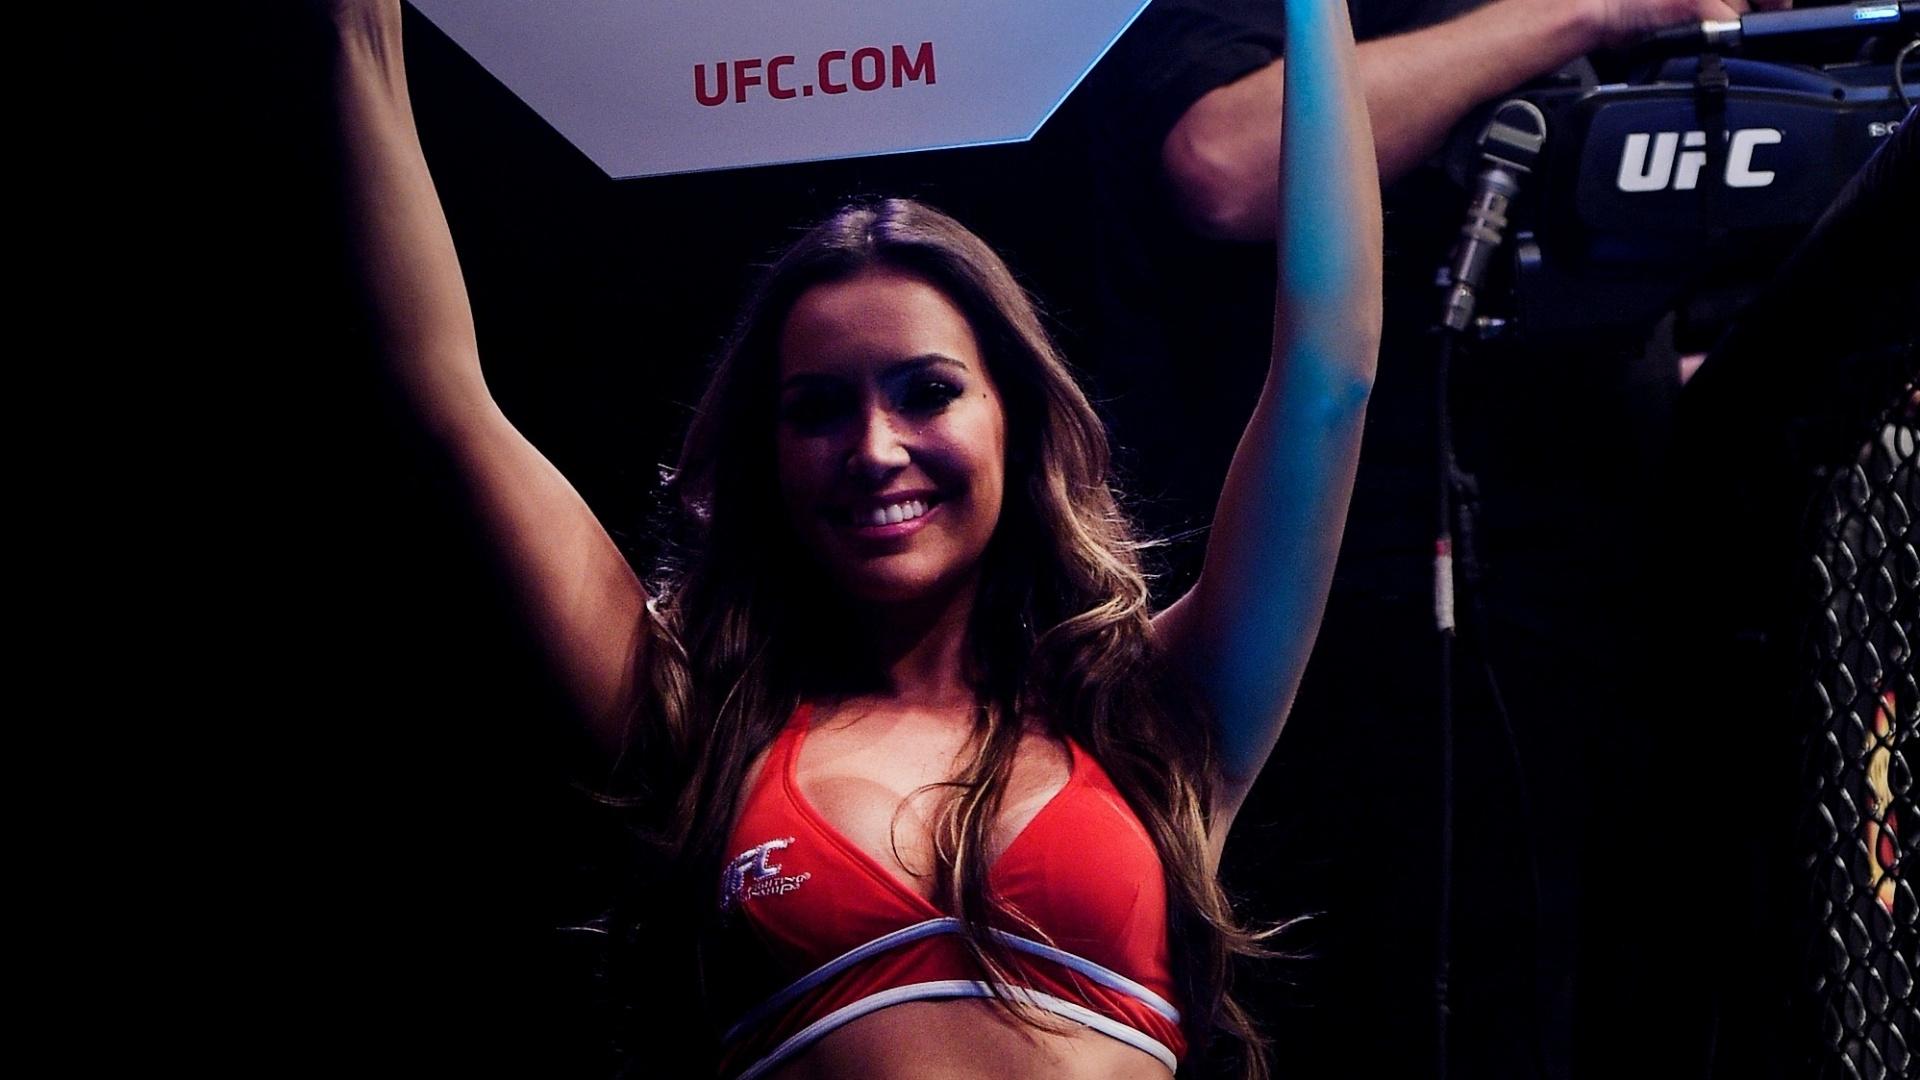 Ring girl Luciana Andrade exibe suas curvas durante o UFC Rio